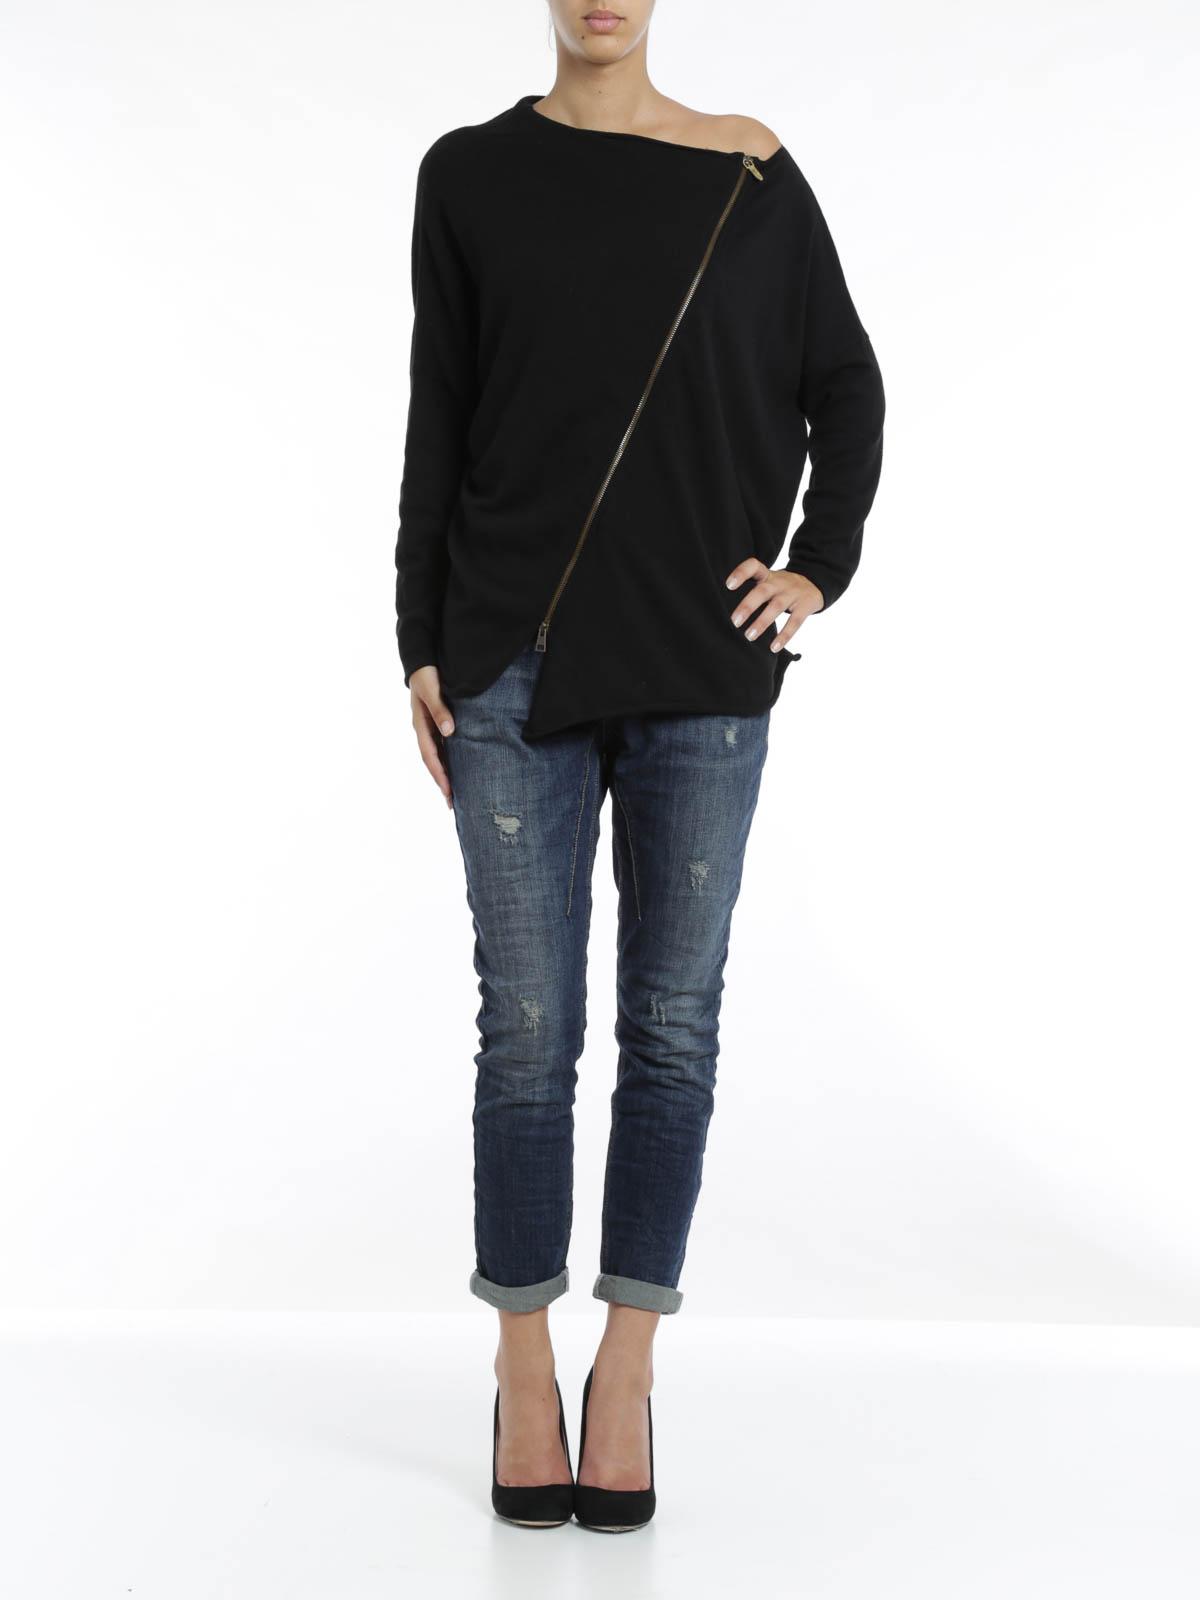 Zipped Top By Manila Grace Denim Sweatshirts amp Sweaters